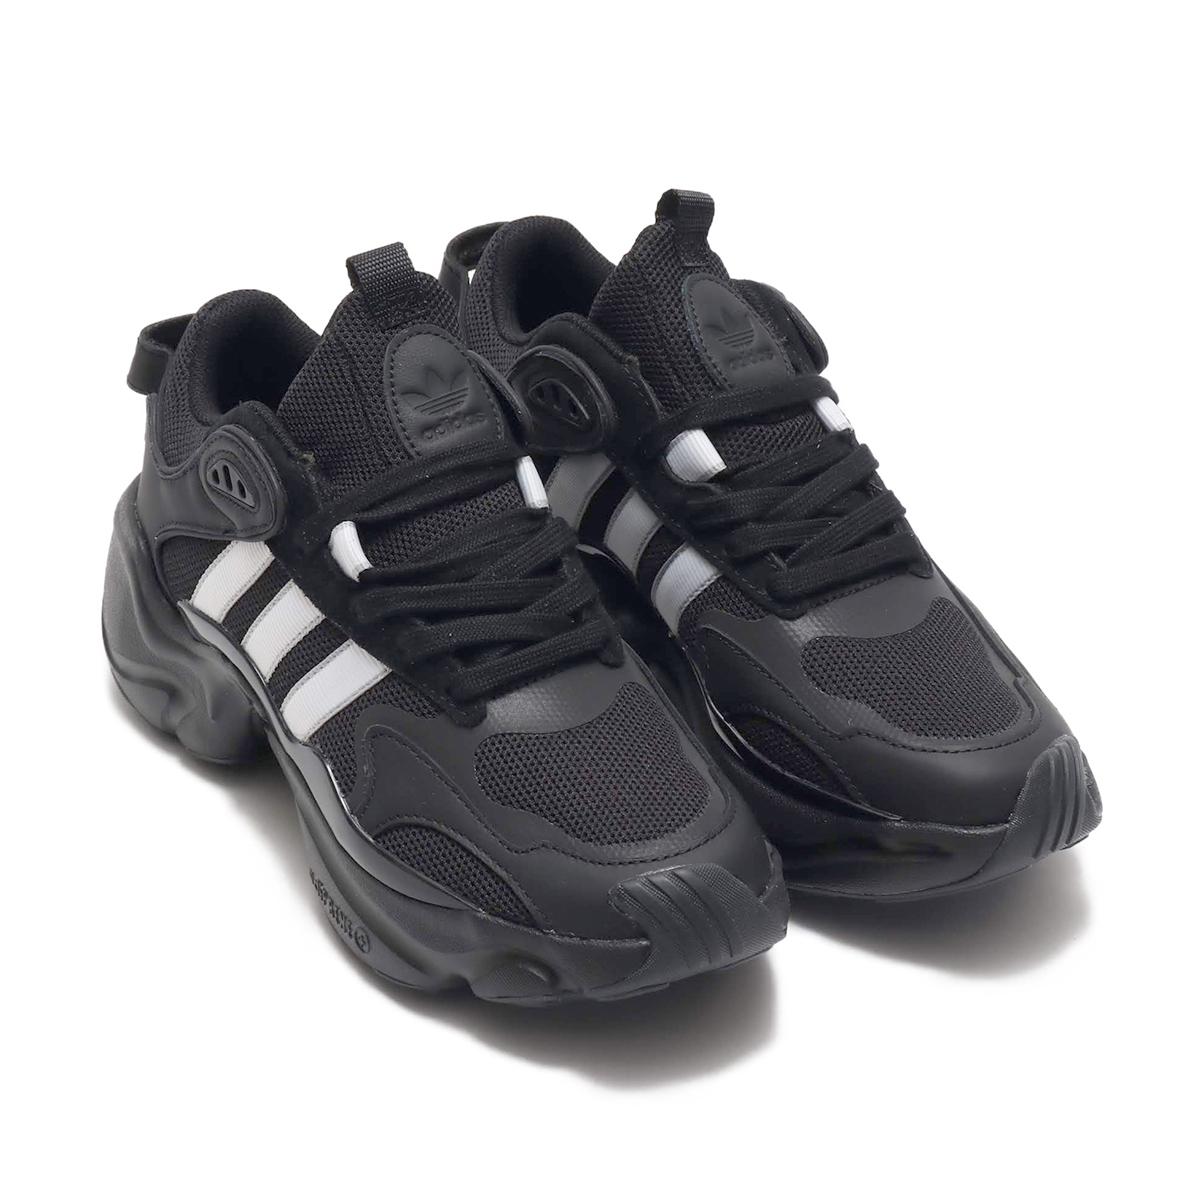 adidas MAGMUR RUNNER W(アディダス マグマ ランナー W)CORE BLACK/RUNNING WHITE/GREY TWO【メンズ レディース スニーカー】19SS-I